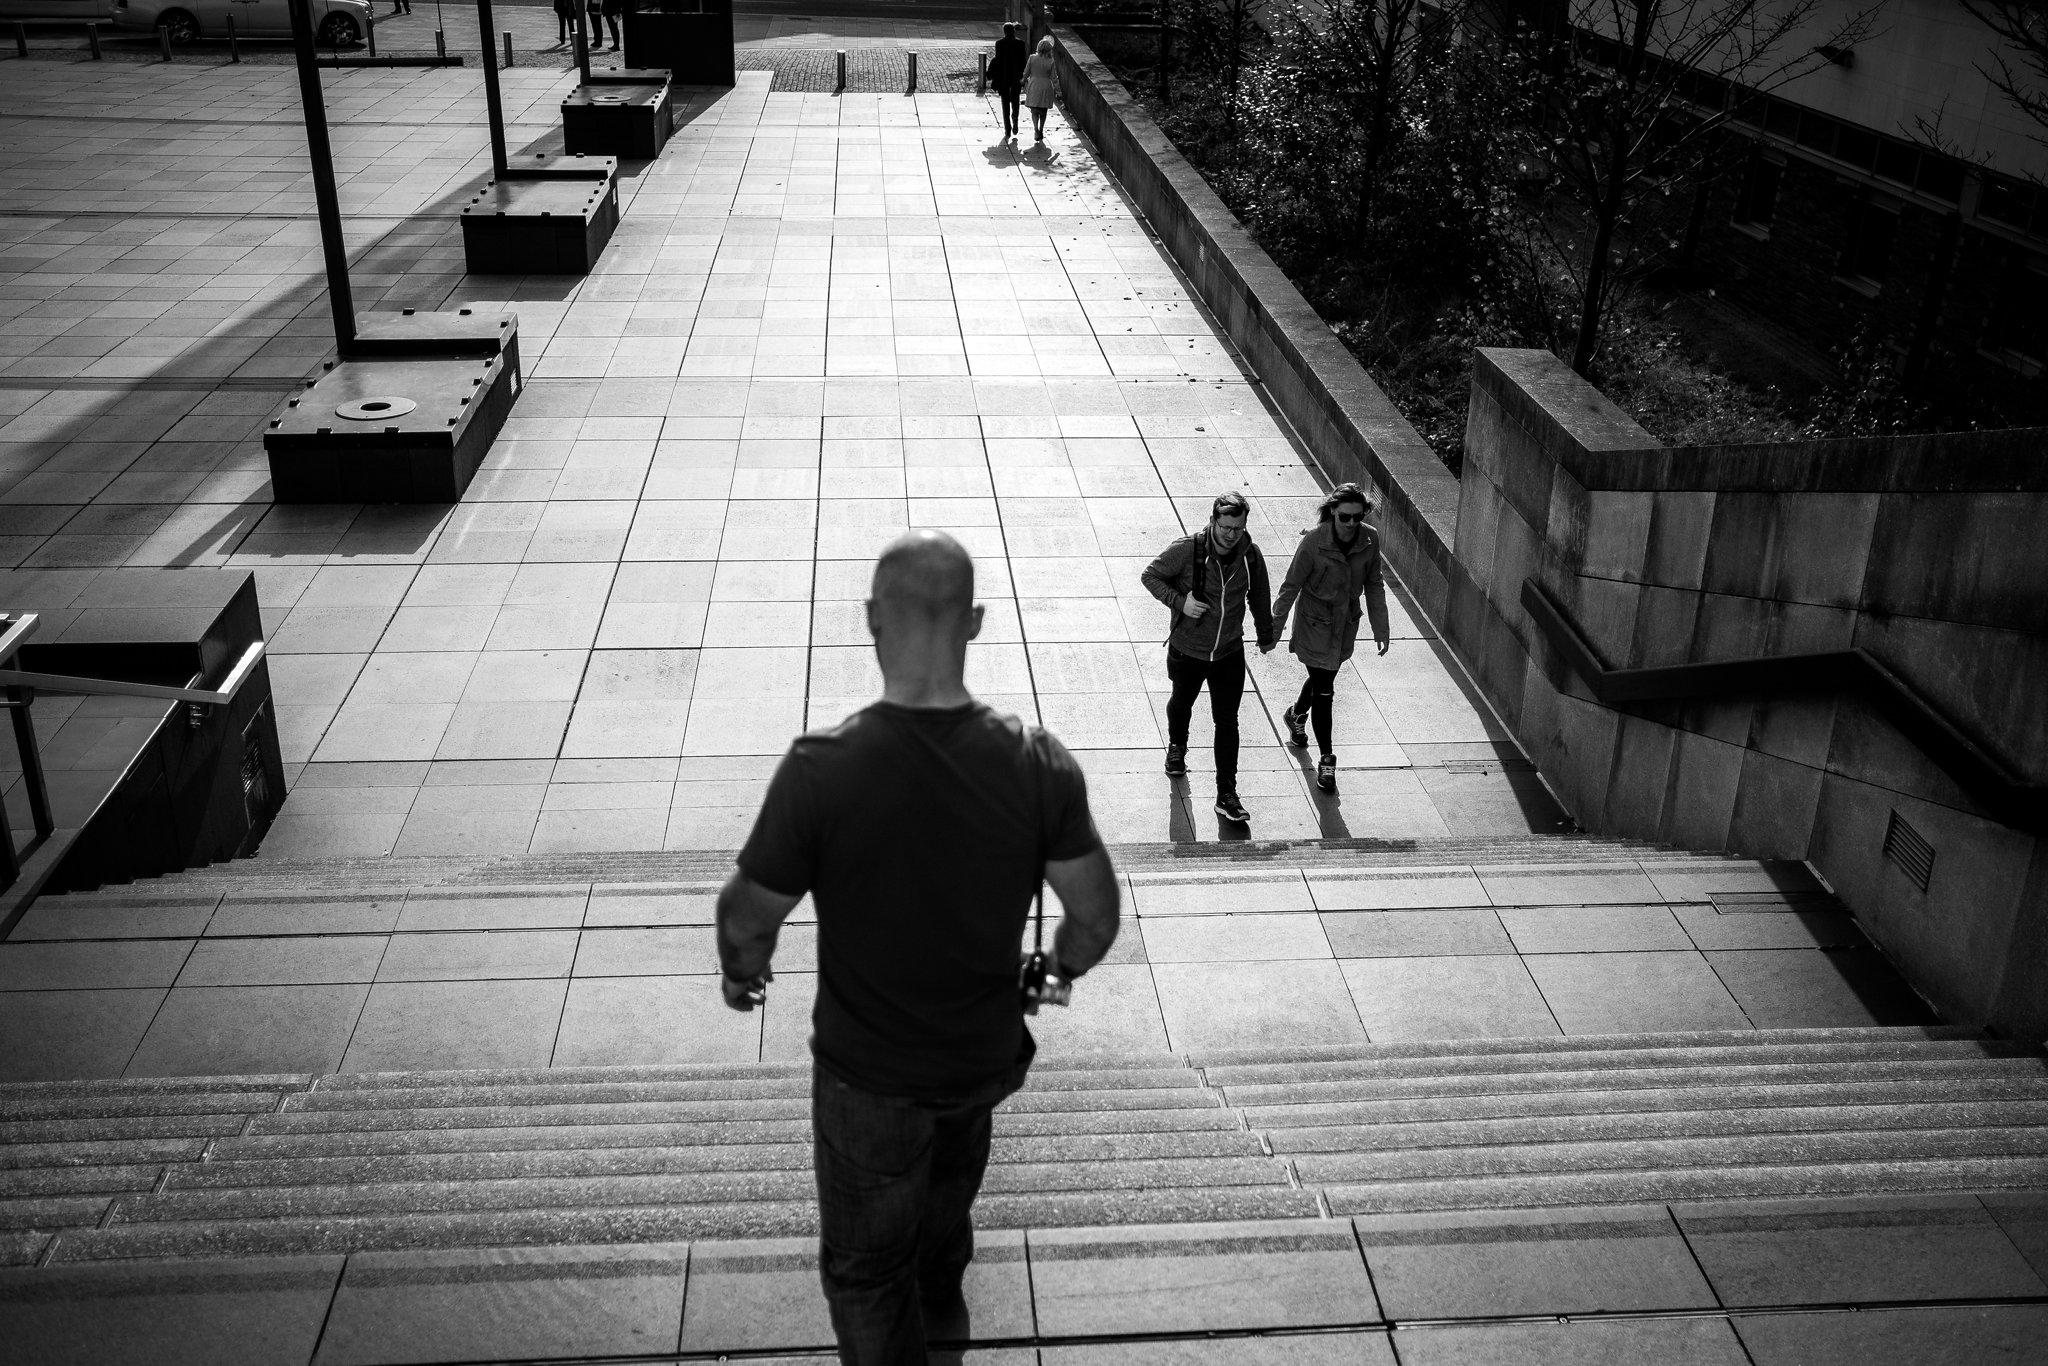 liverpool-street-photography_0016.jpg